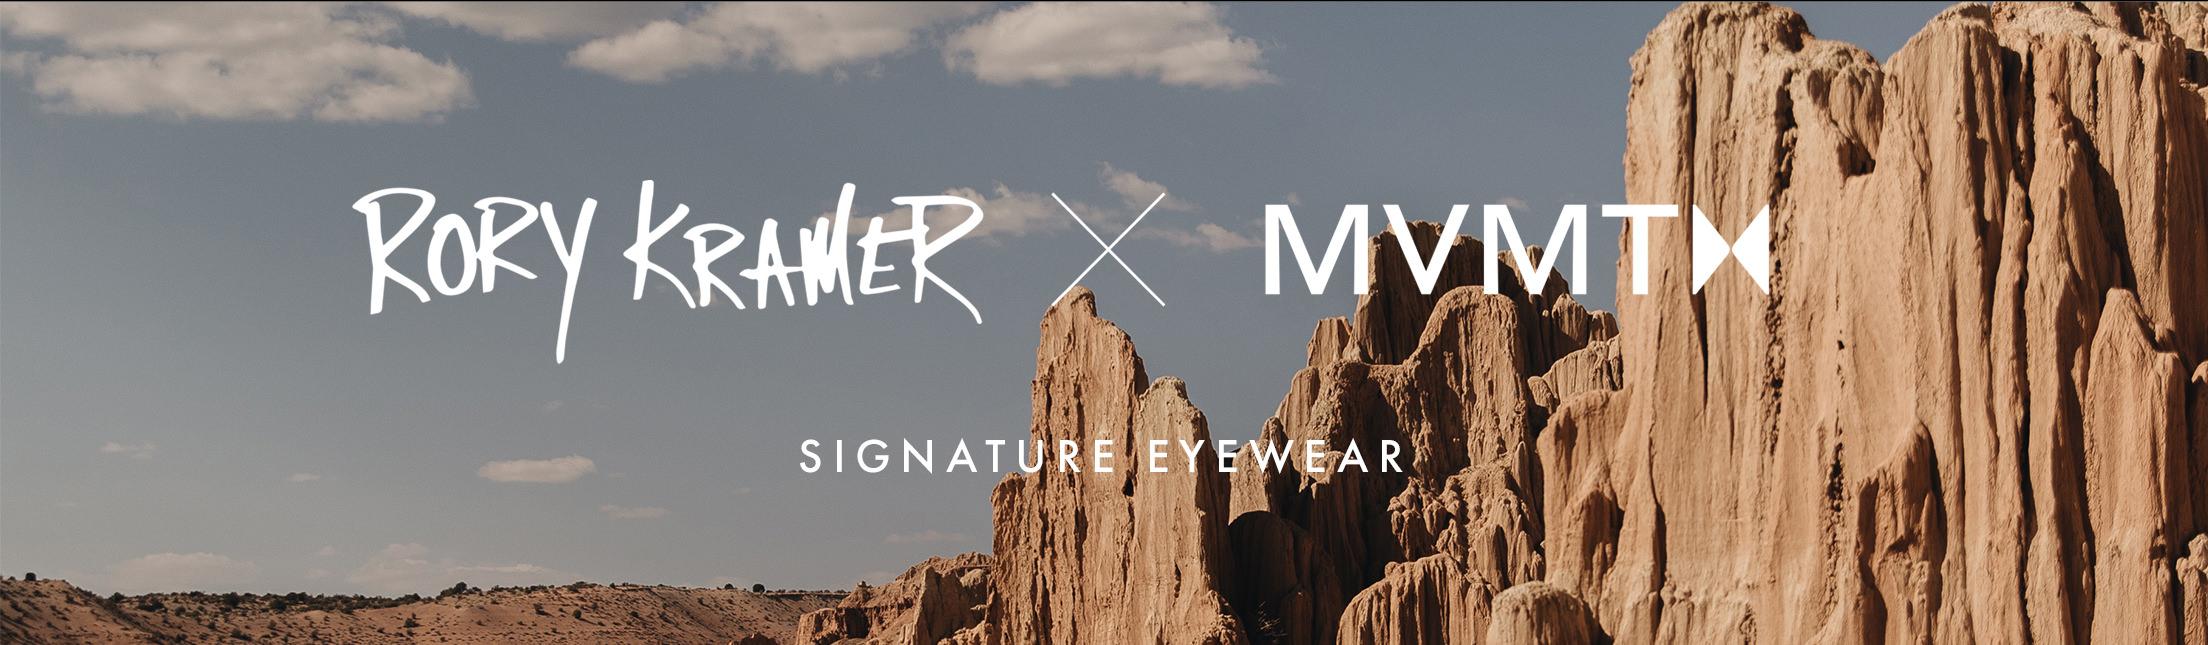 Rory Kramer x MVMT Signature Eyewear